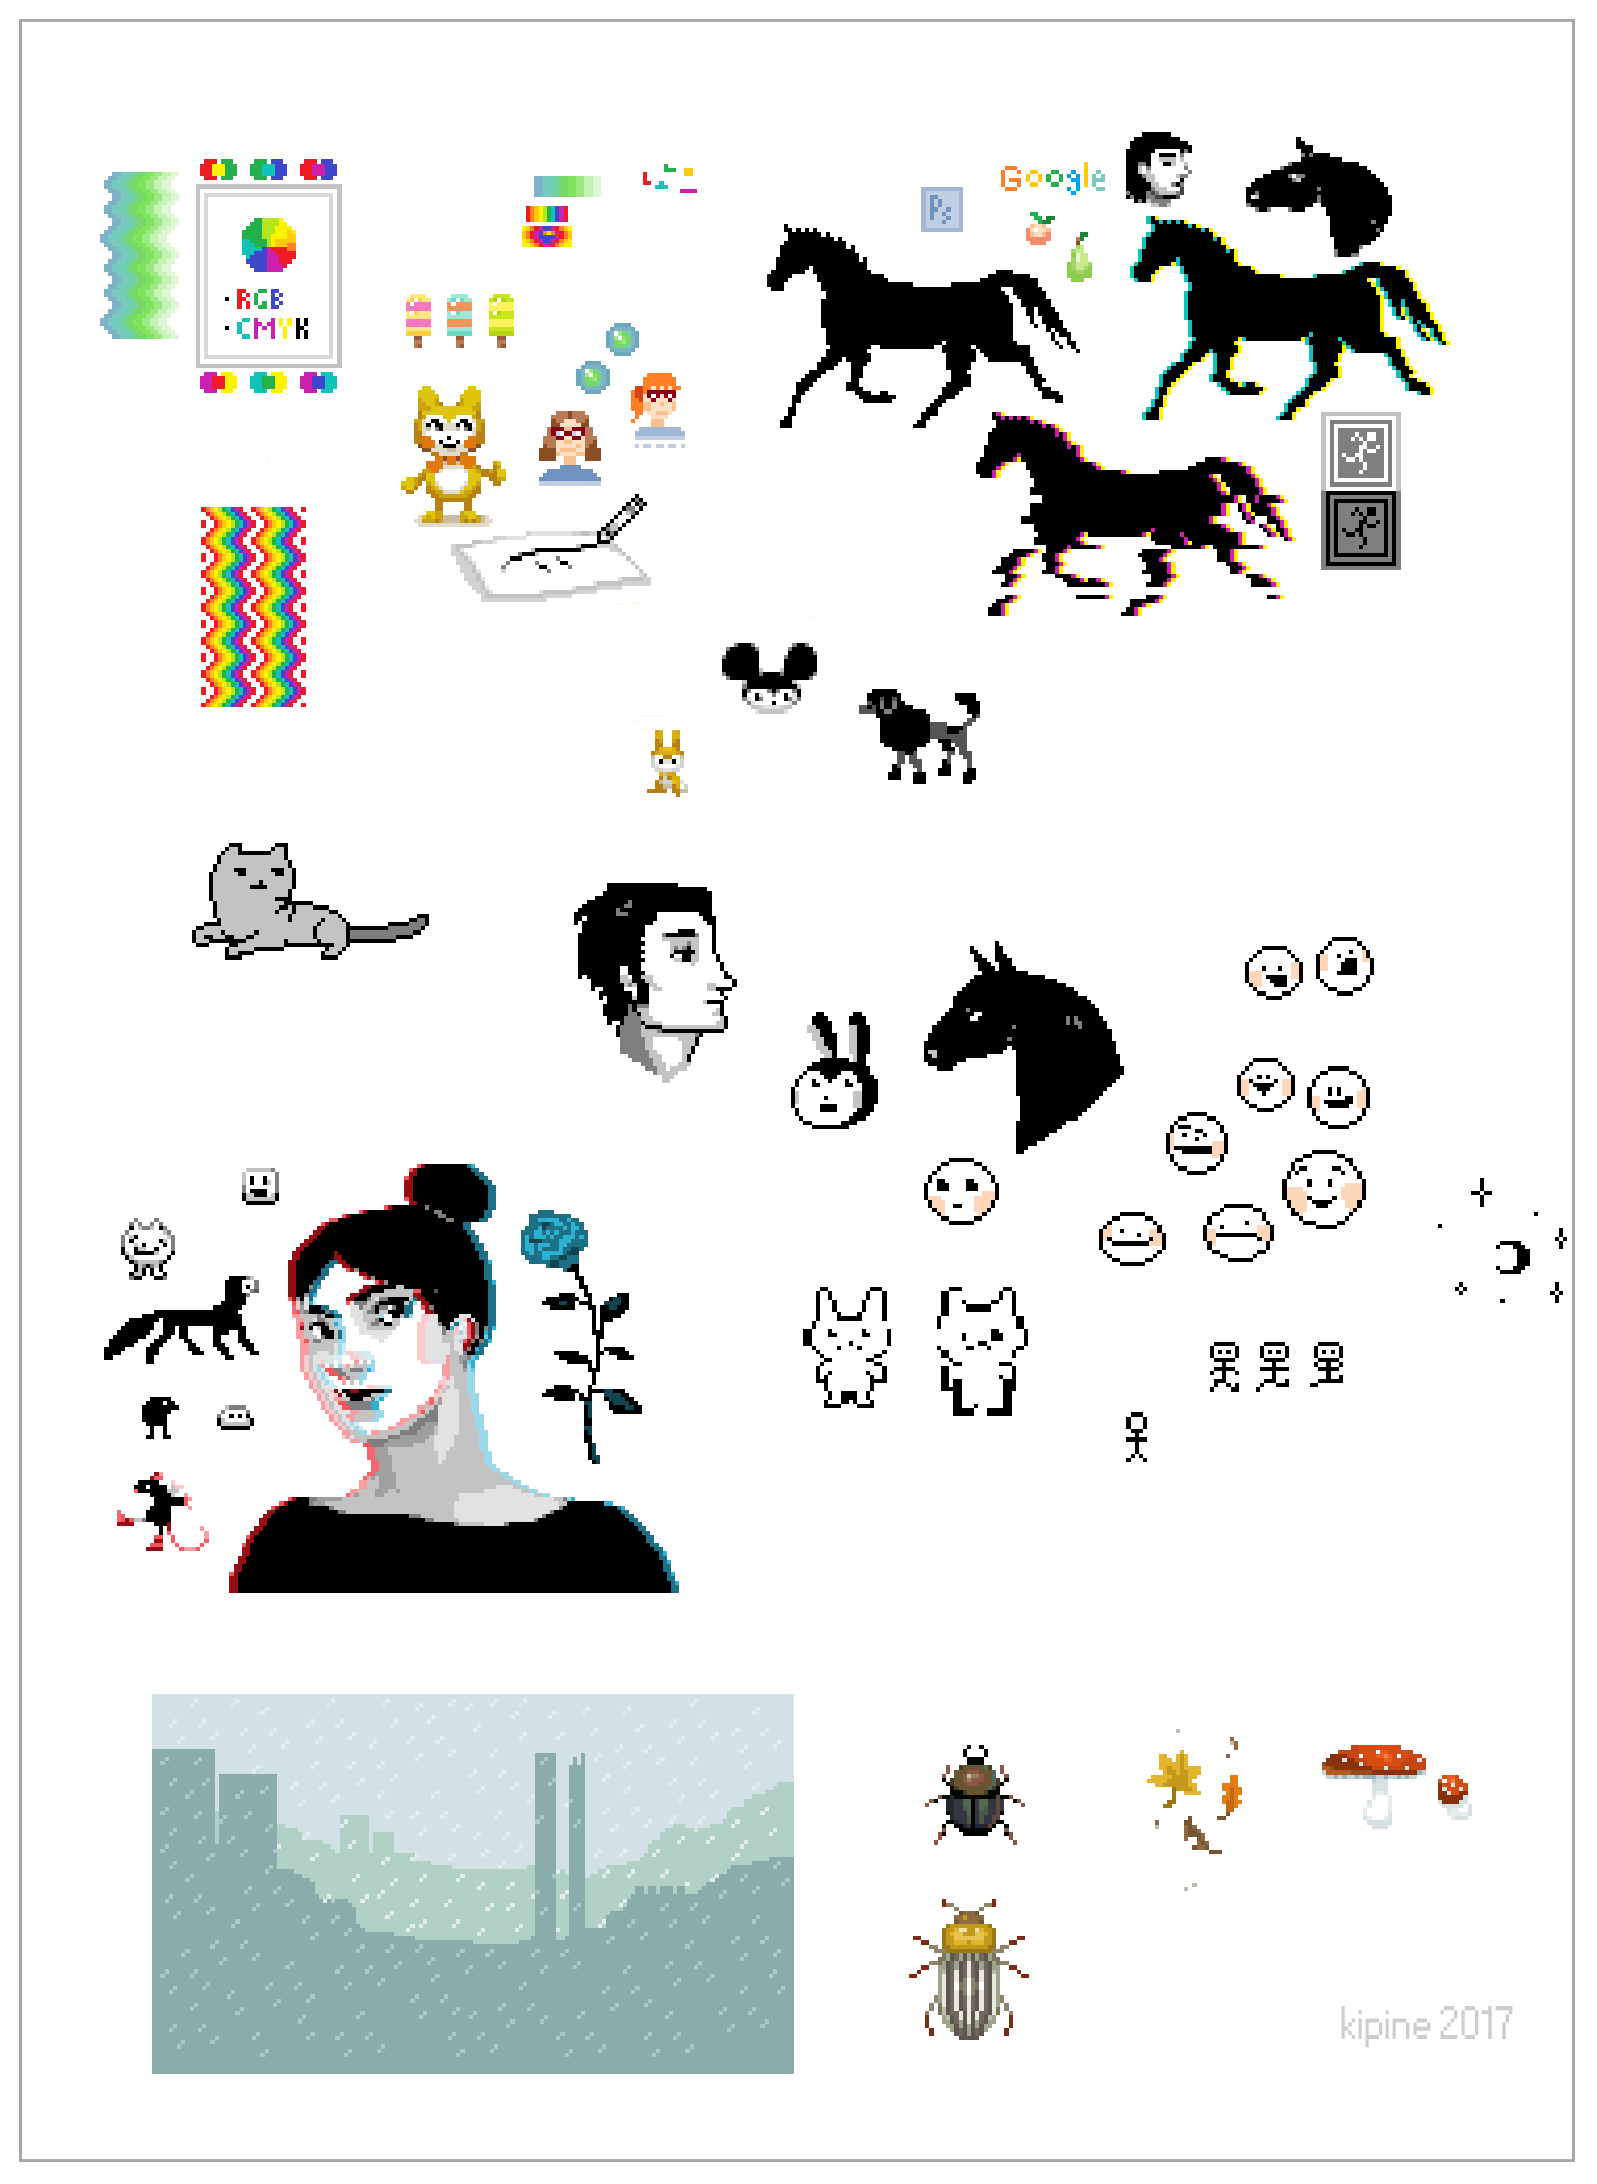 Pixels by Kipine